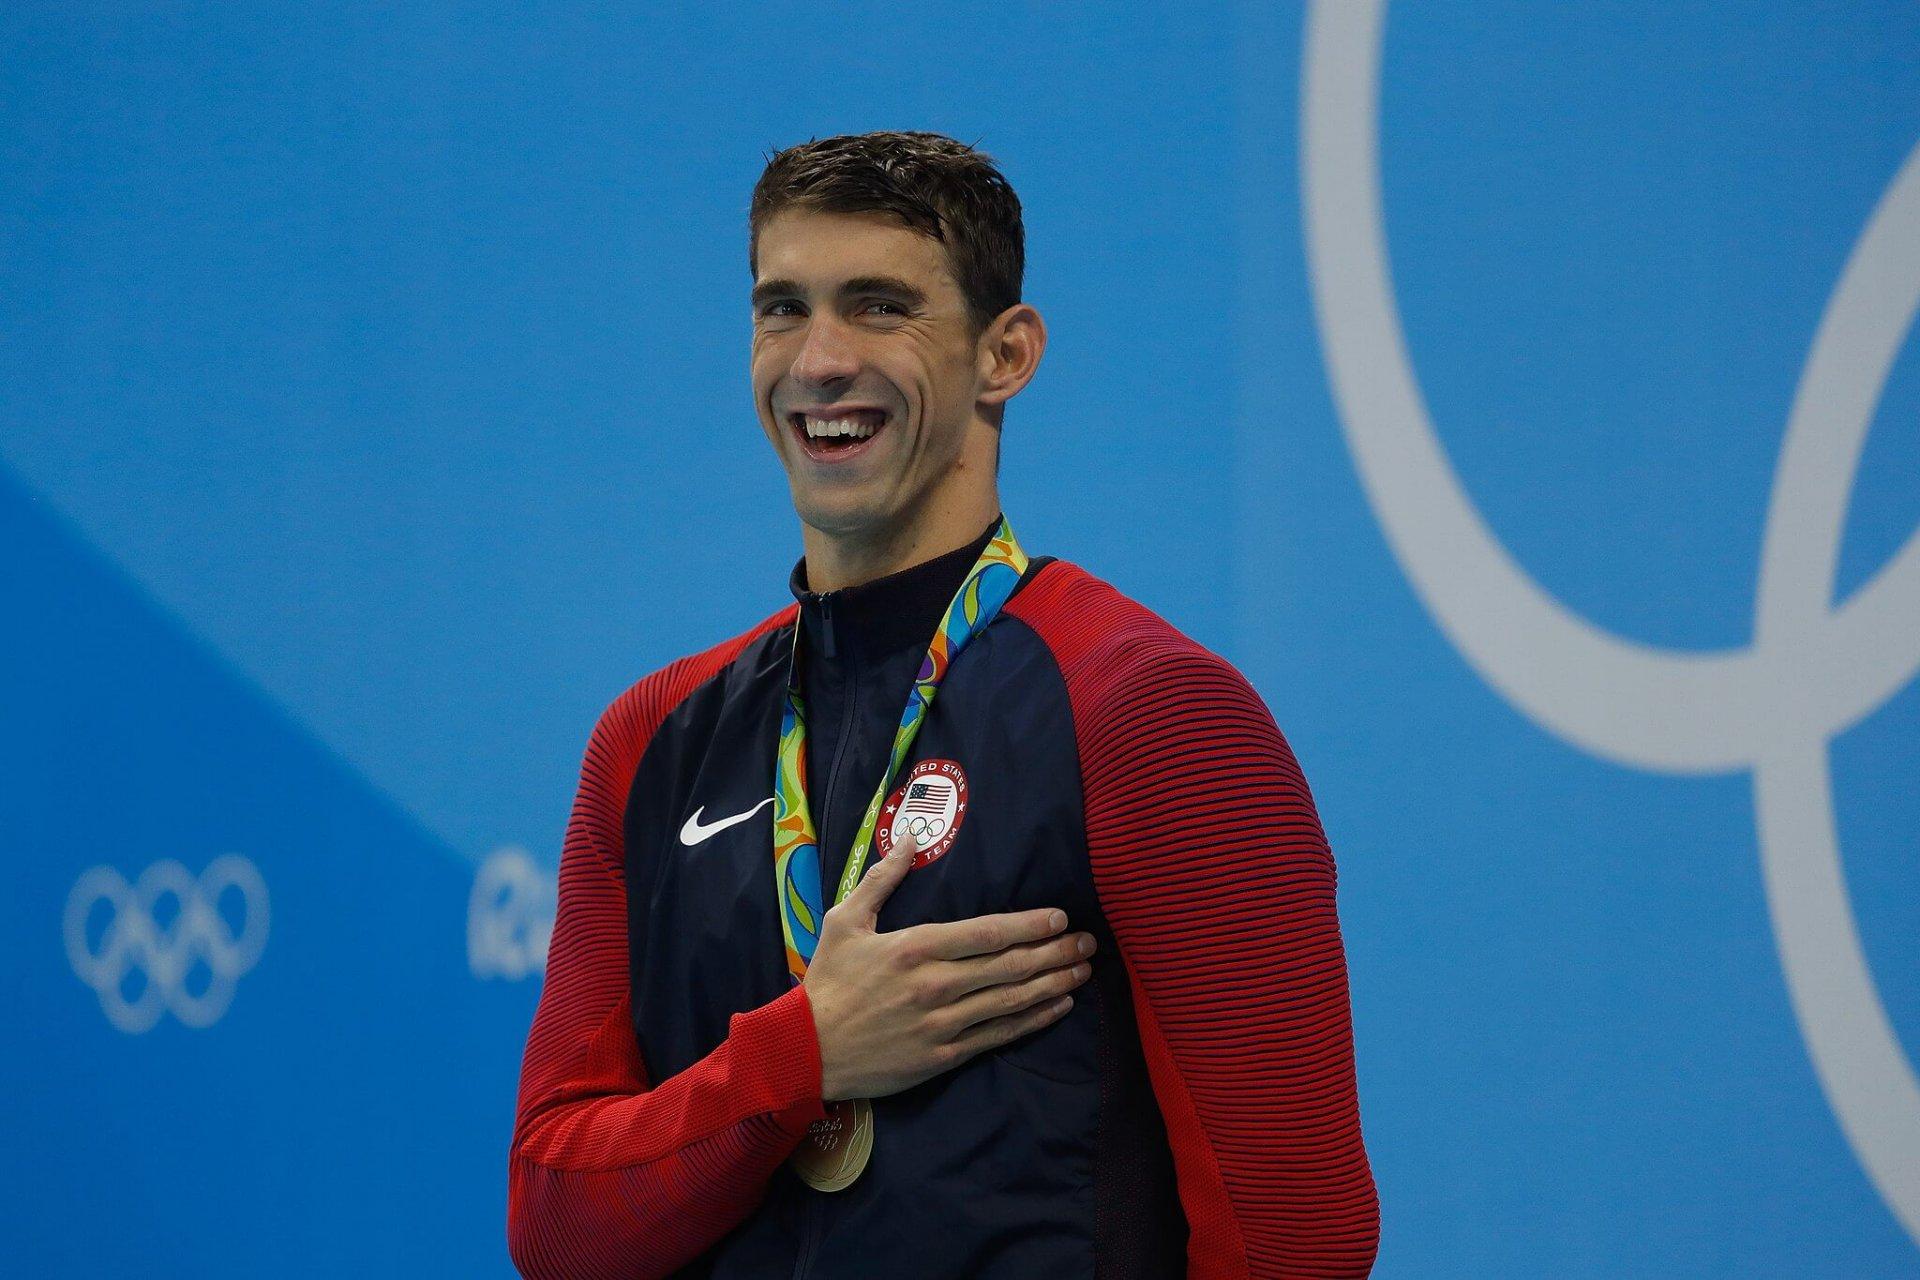 Michael Phelps Bild: Fernando Frazão/Agência Brasil [CC BY 3.0 br (https://creativecommons.org/licenses/by/3.0/br/deed.en)], via Wikimedia Commons